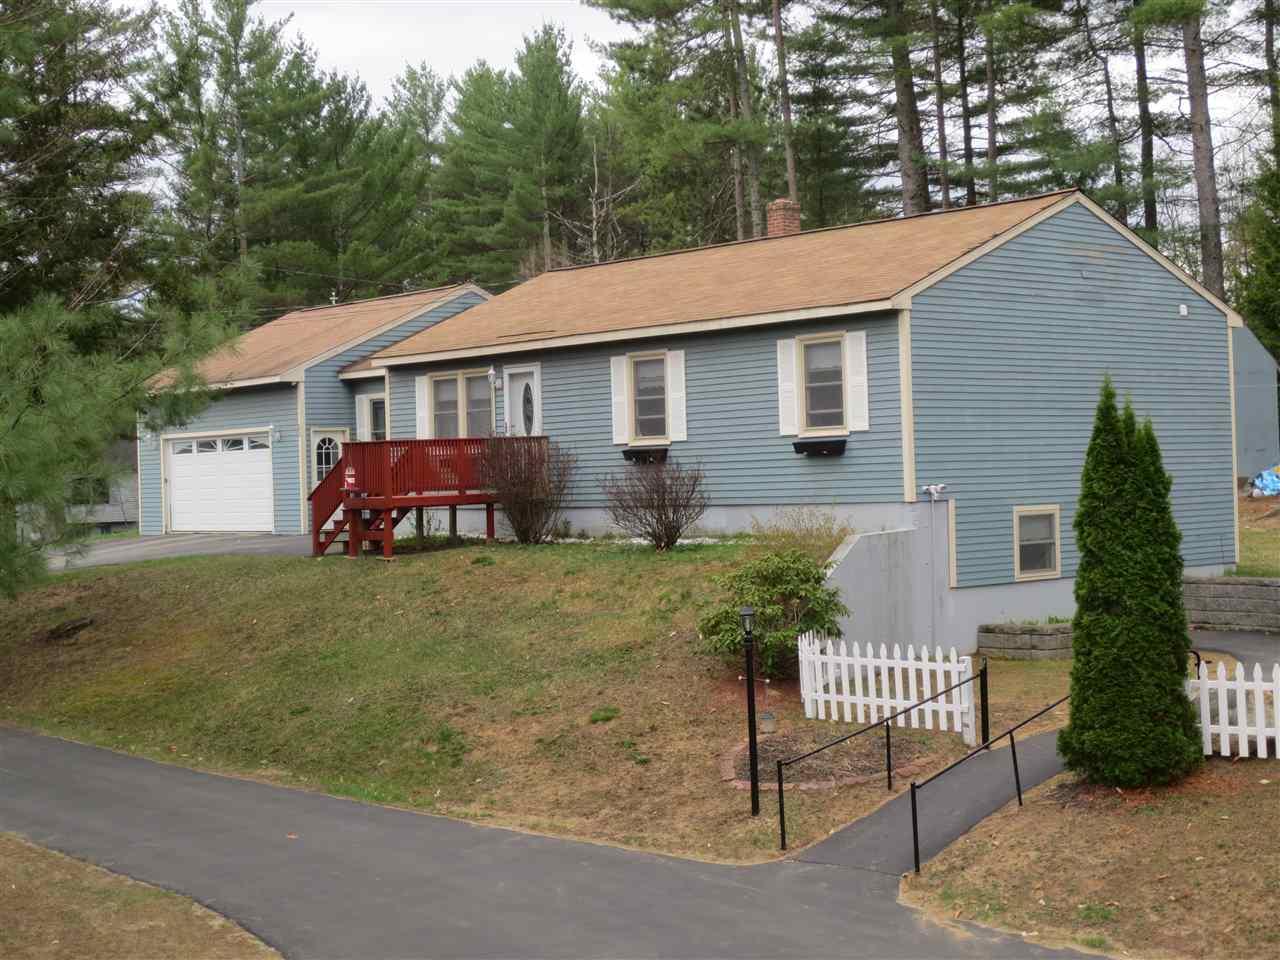 22 Pine Meadow, New Hampton, NH 03256